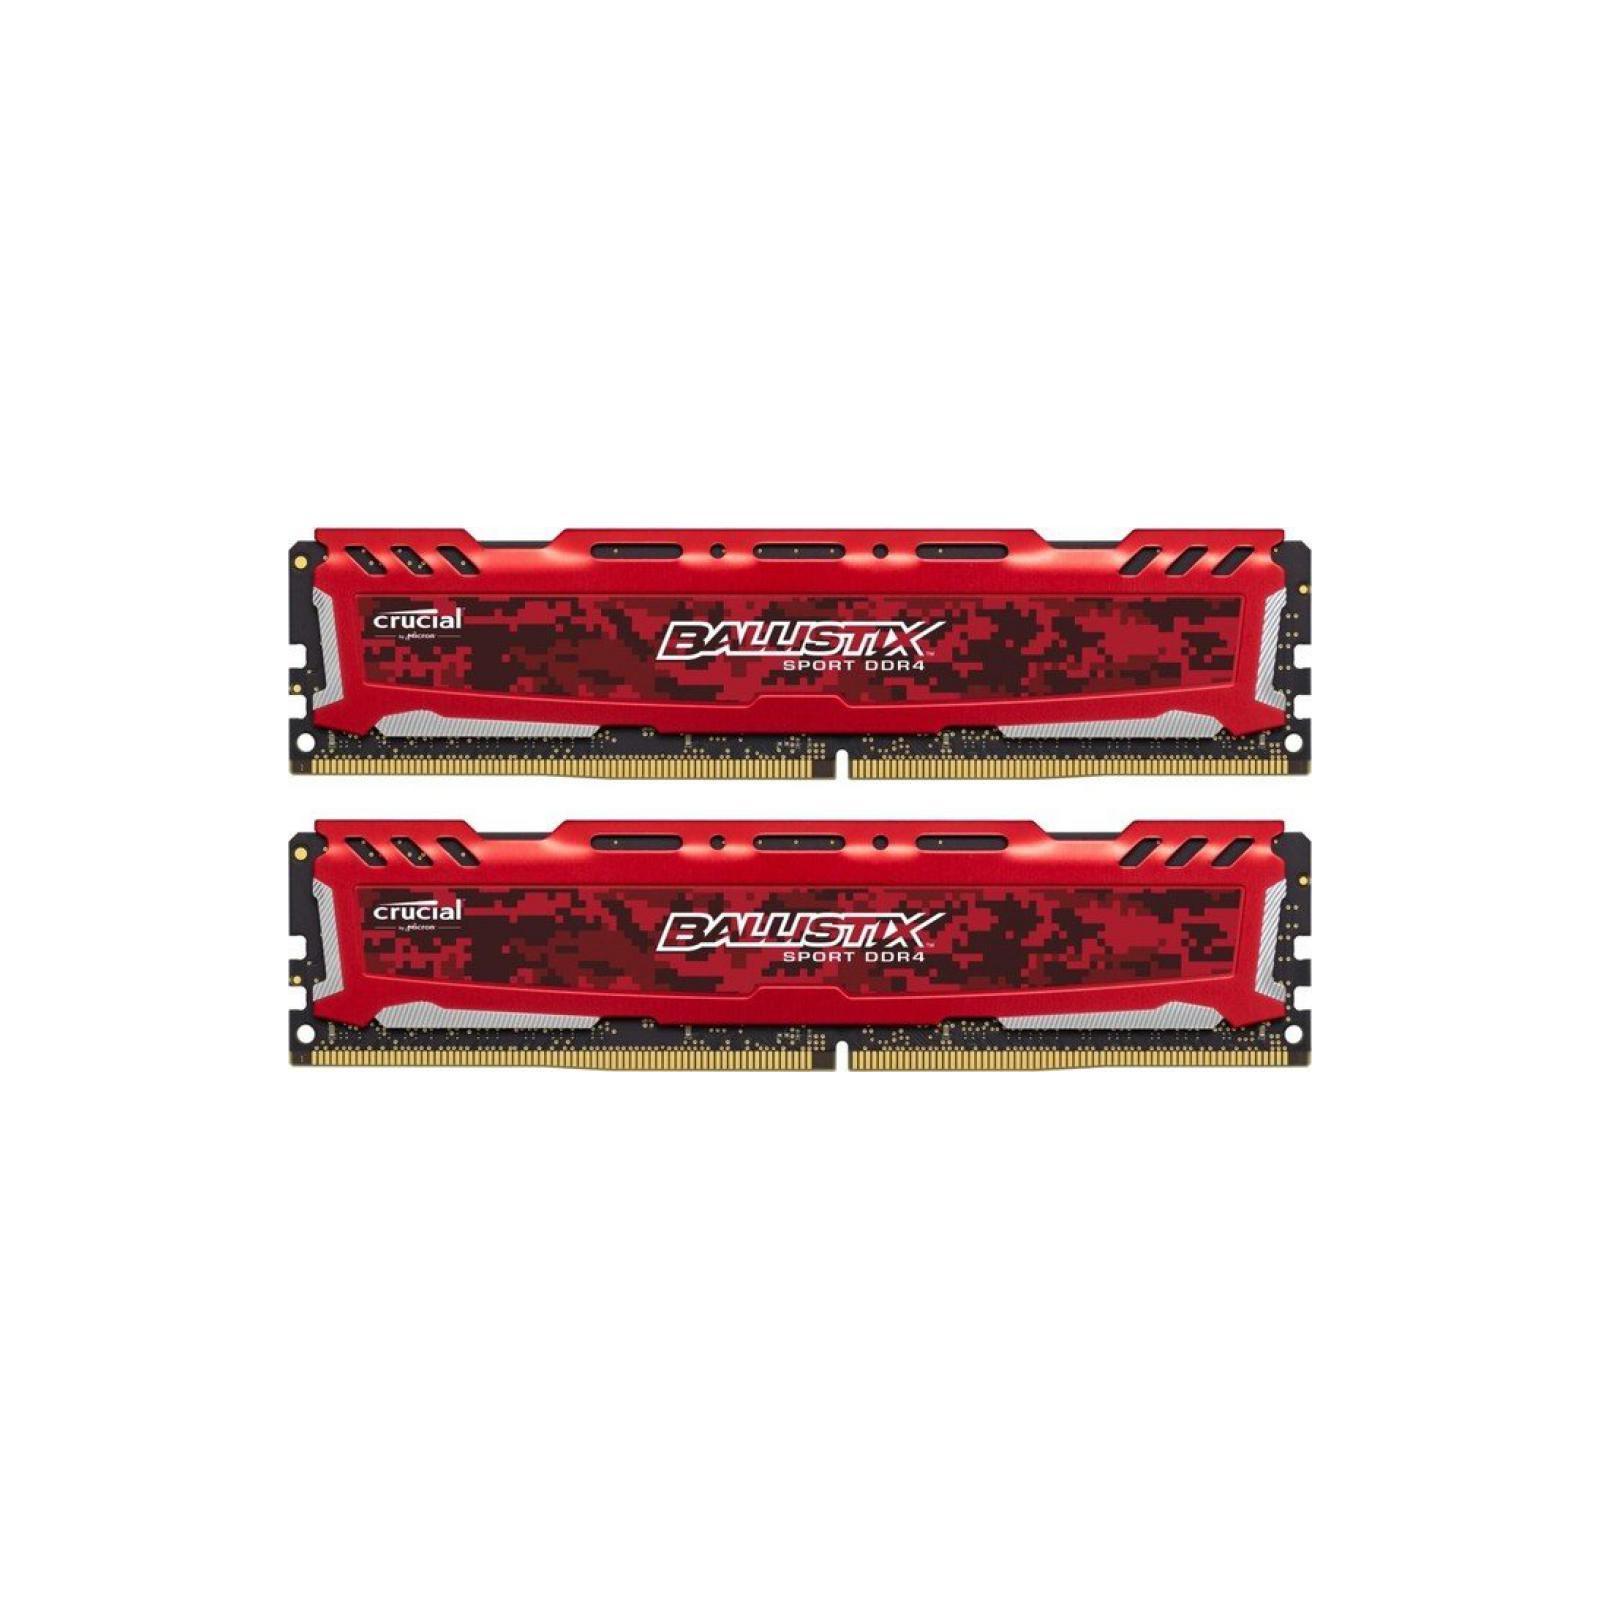 Модуль памяти для компьютера DDR4 32GB (2x16GB) 2666 MHz Ballistix Sport LT Micron (BLS2C16G4D26BFSE)